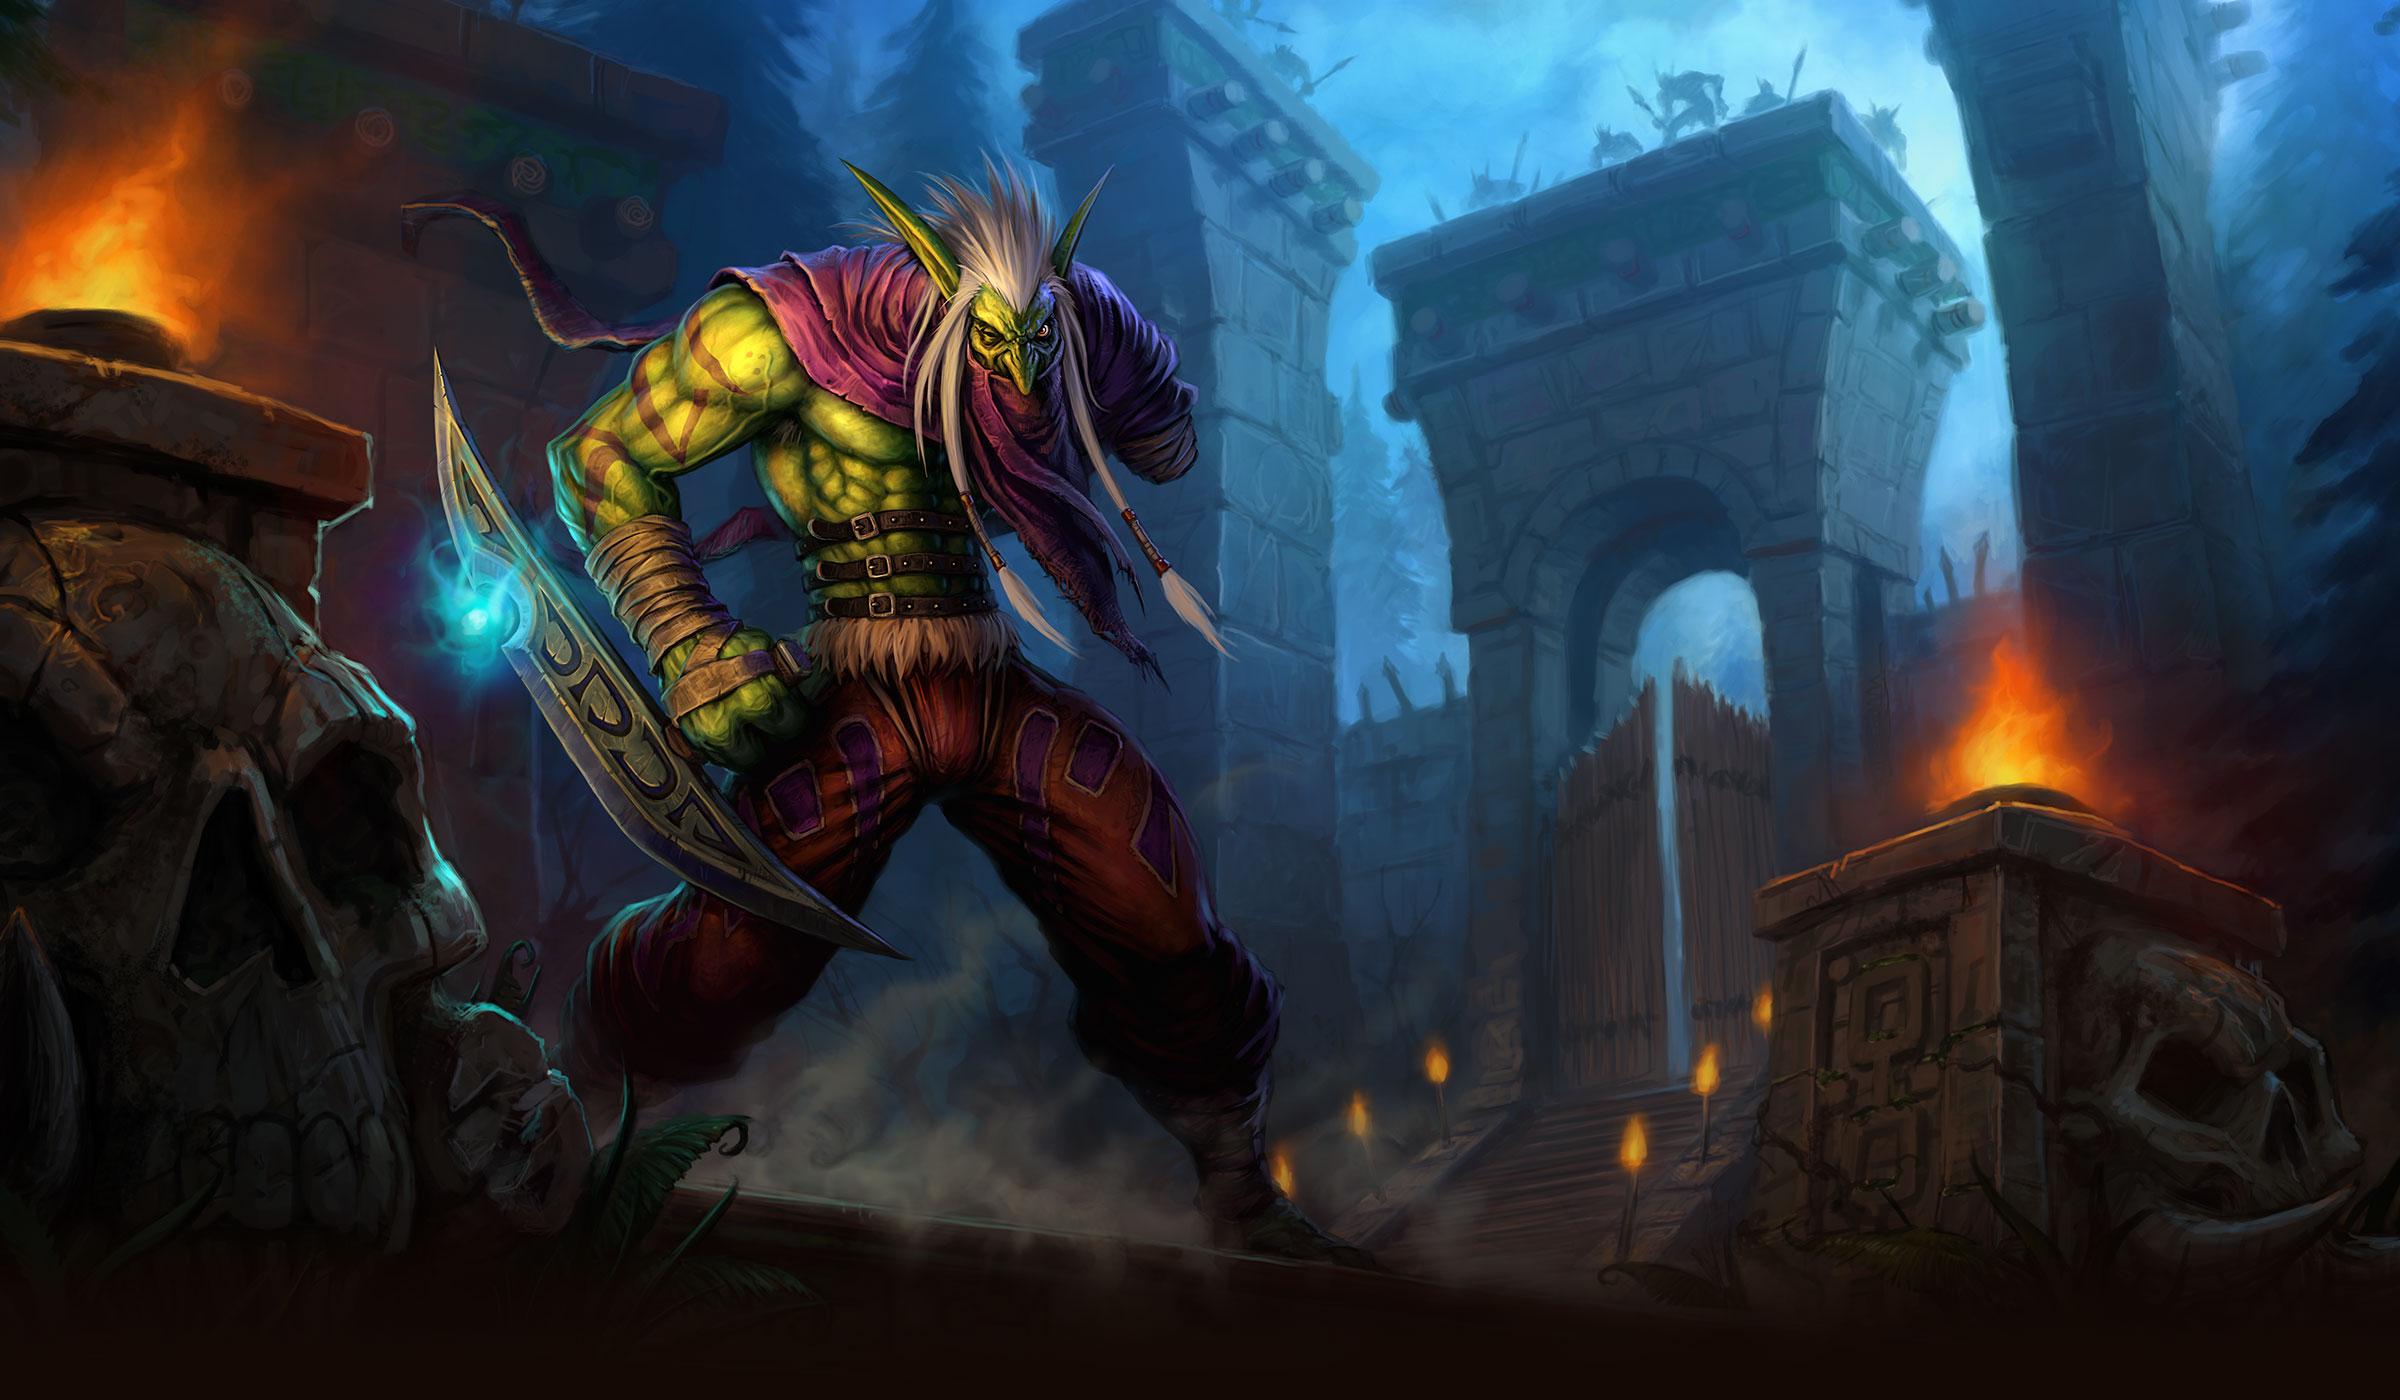 Os Deuses de Zul'Aman Patch 2.3 | World of WarCraft, WarCraft, wow, azeroth, lore